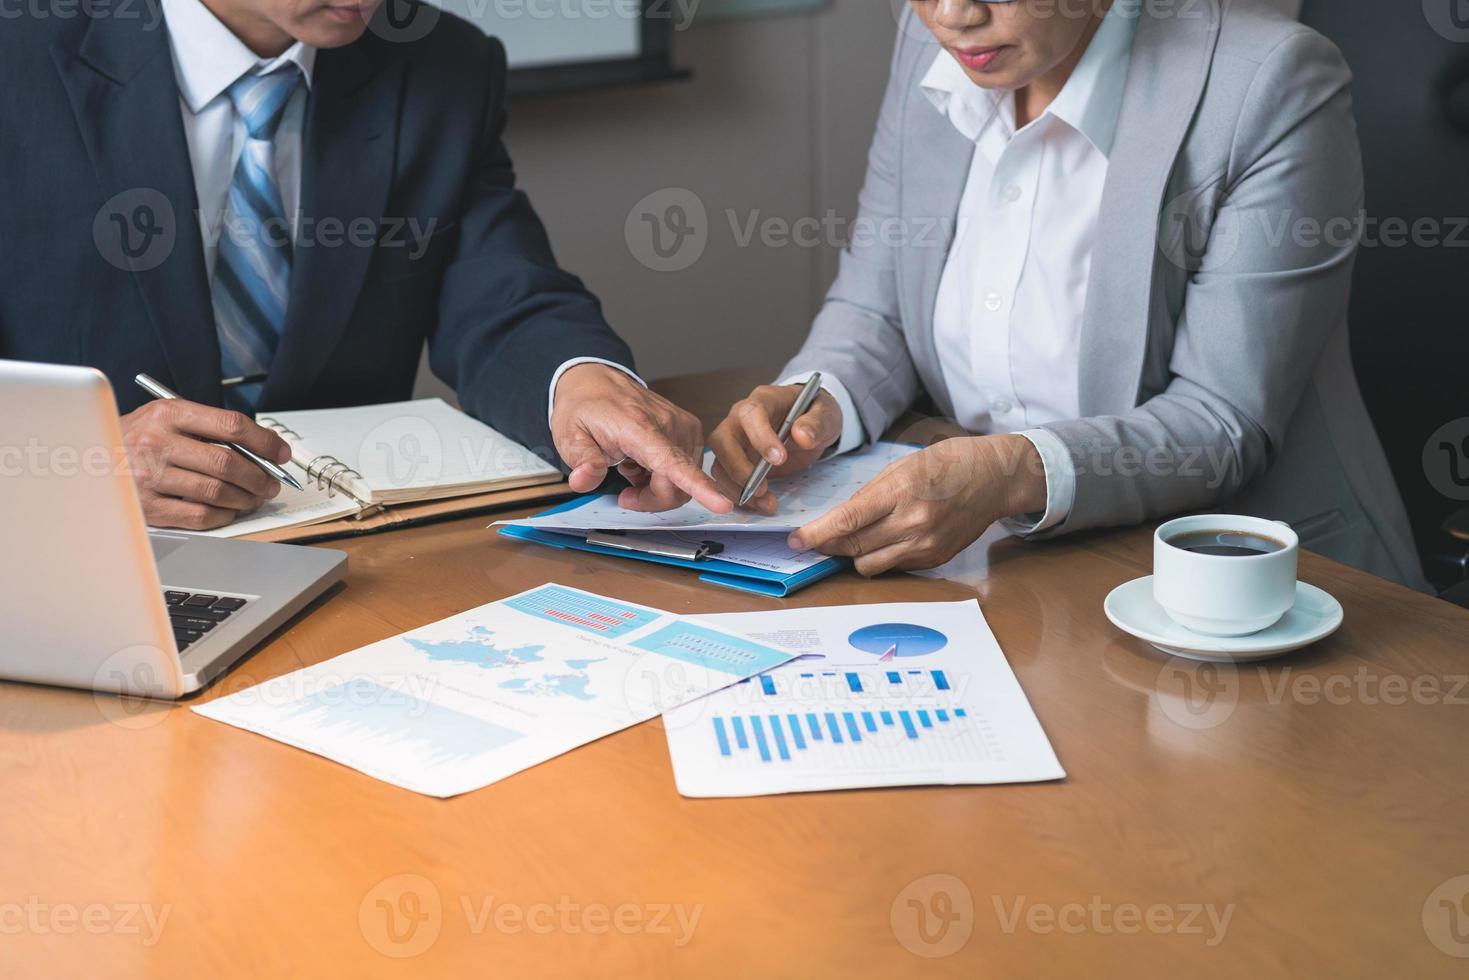 analisando relatórios financeiros foto